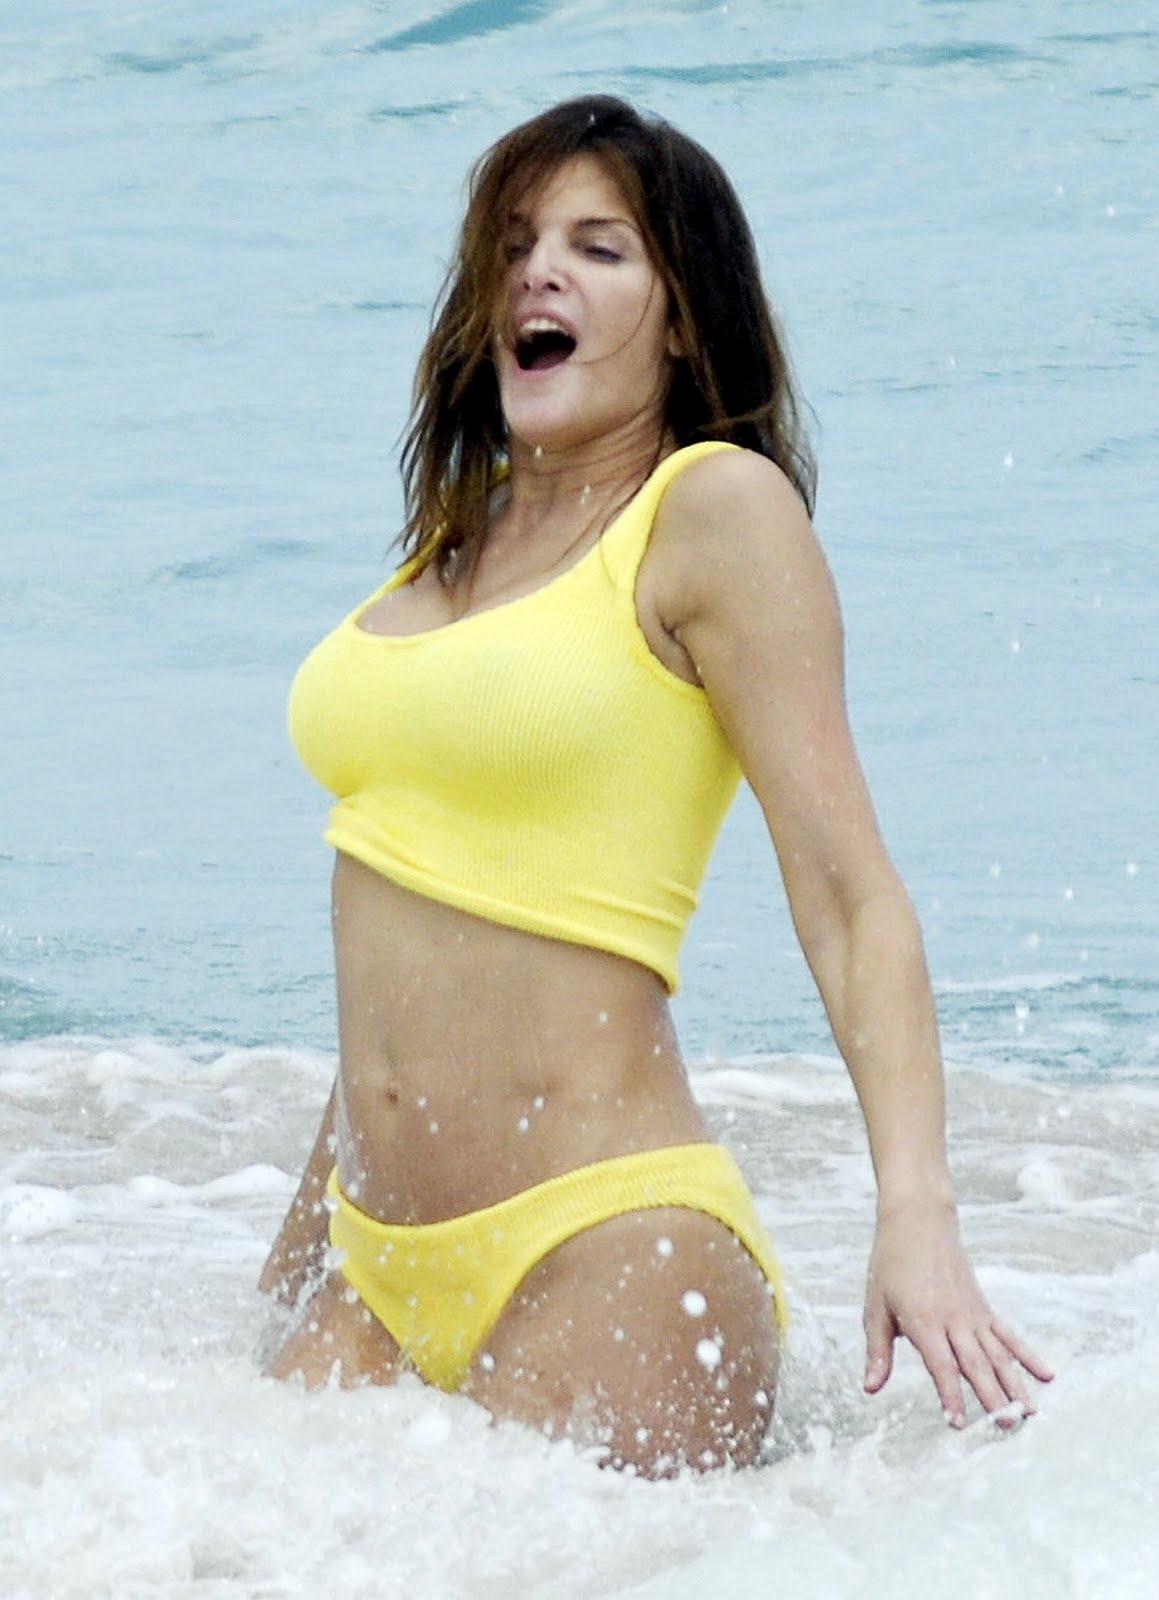 http://1.bp.blogspot.com/-PBn2rfQrB7s/TdvcubqEe_I/AAAAAAAACKo/EwwrpZwAvec/s1600/Stephanie+Seymour+in+Bikini+4.jpg